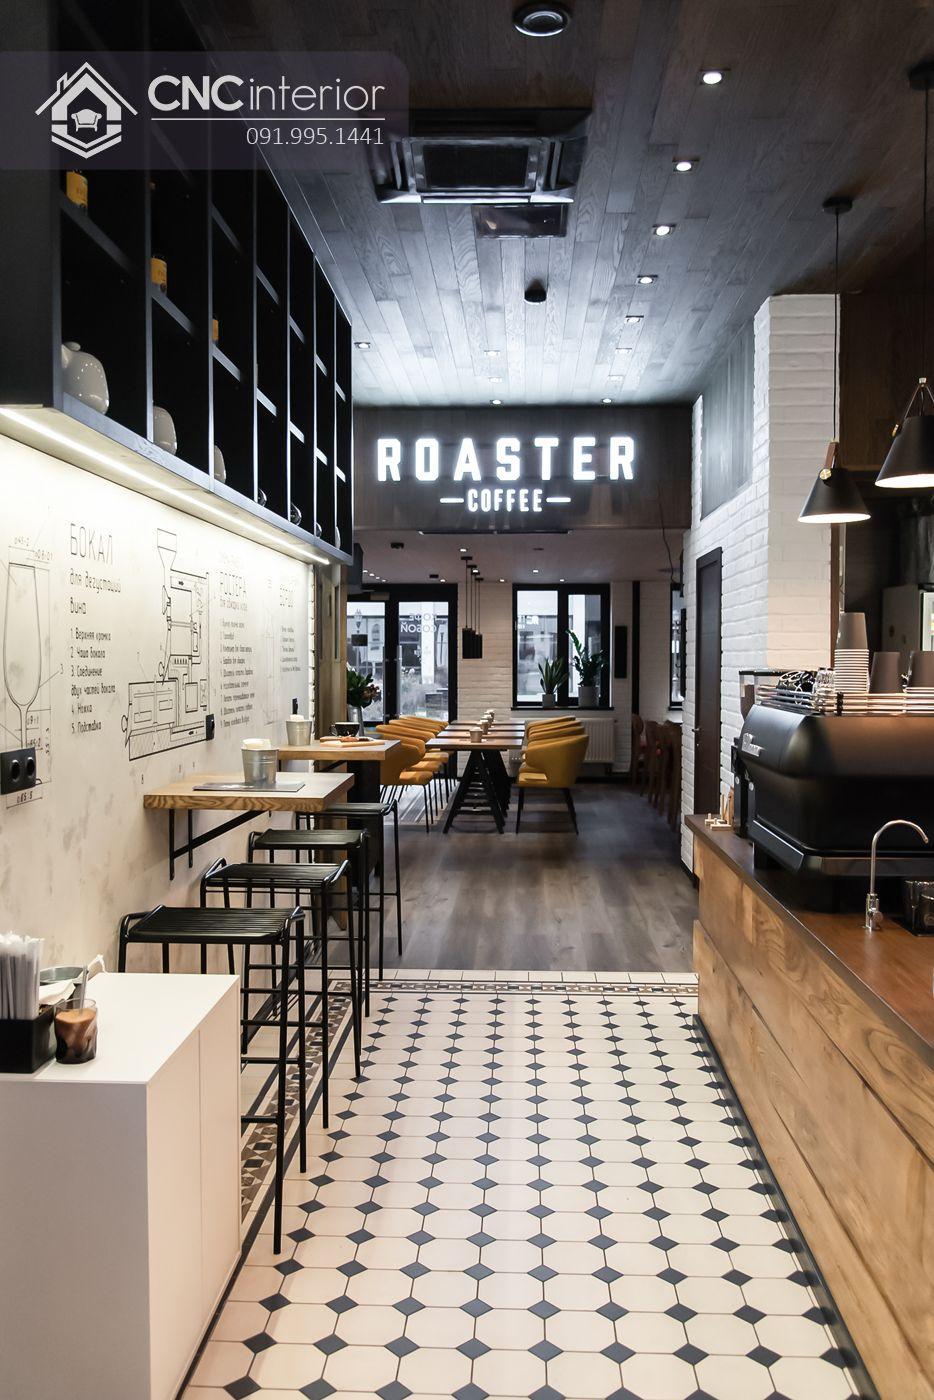 quán cafe Roaster phong cách Bistro.